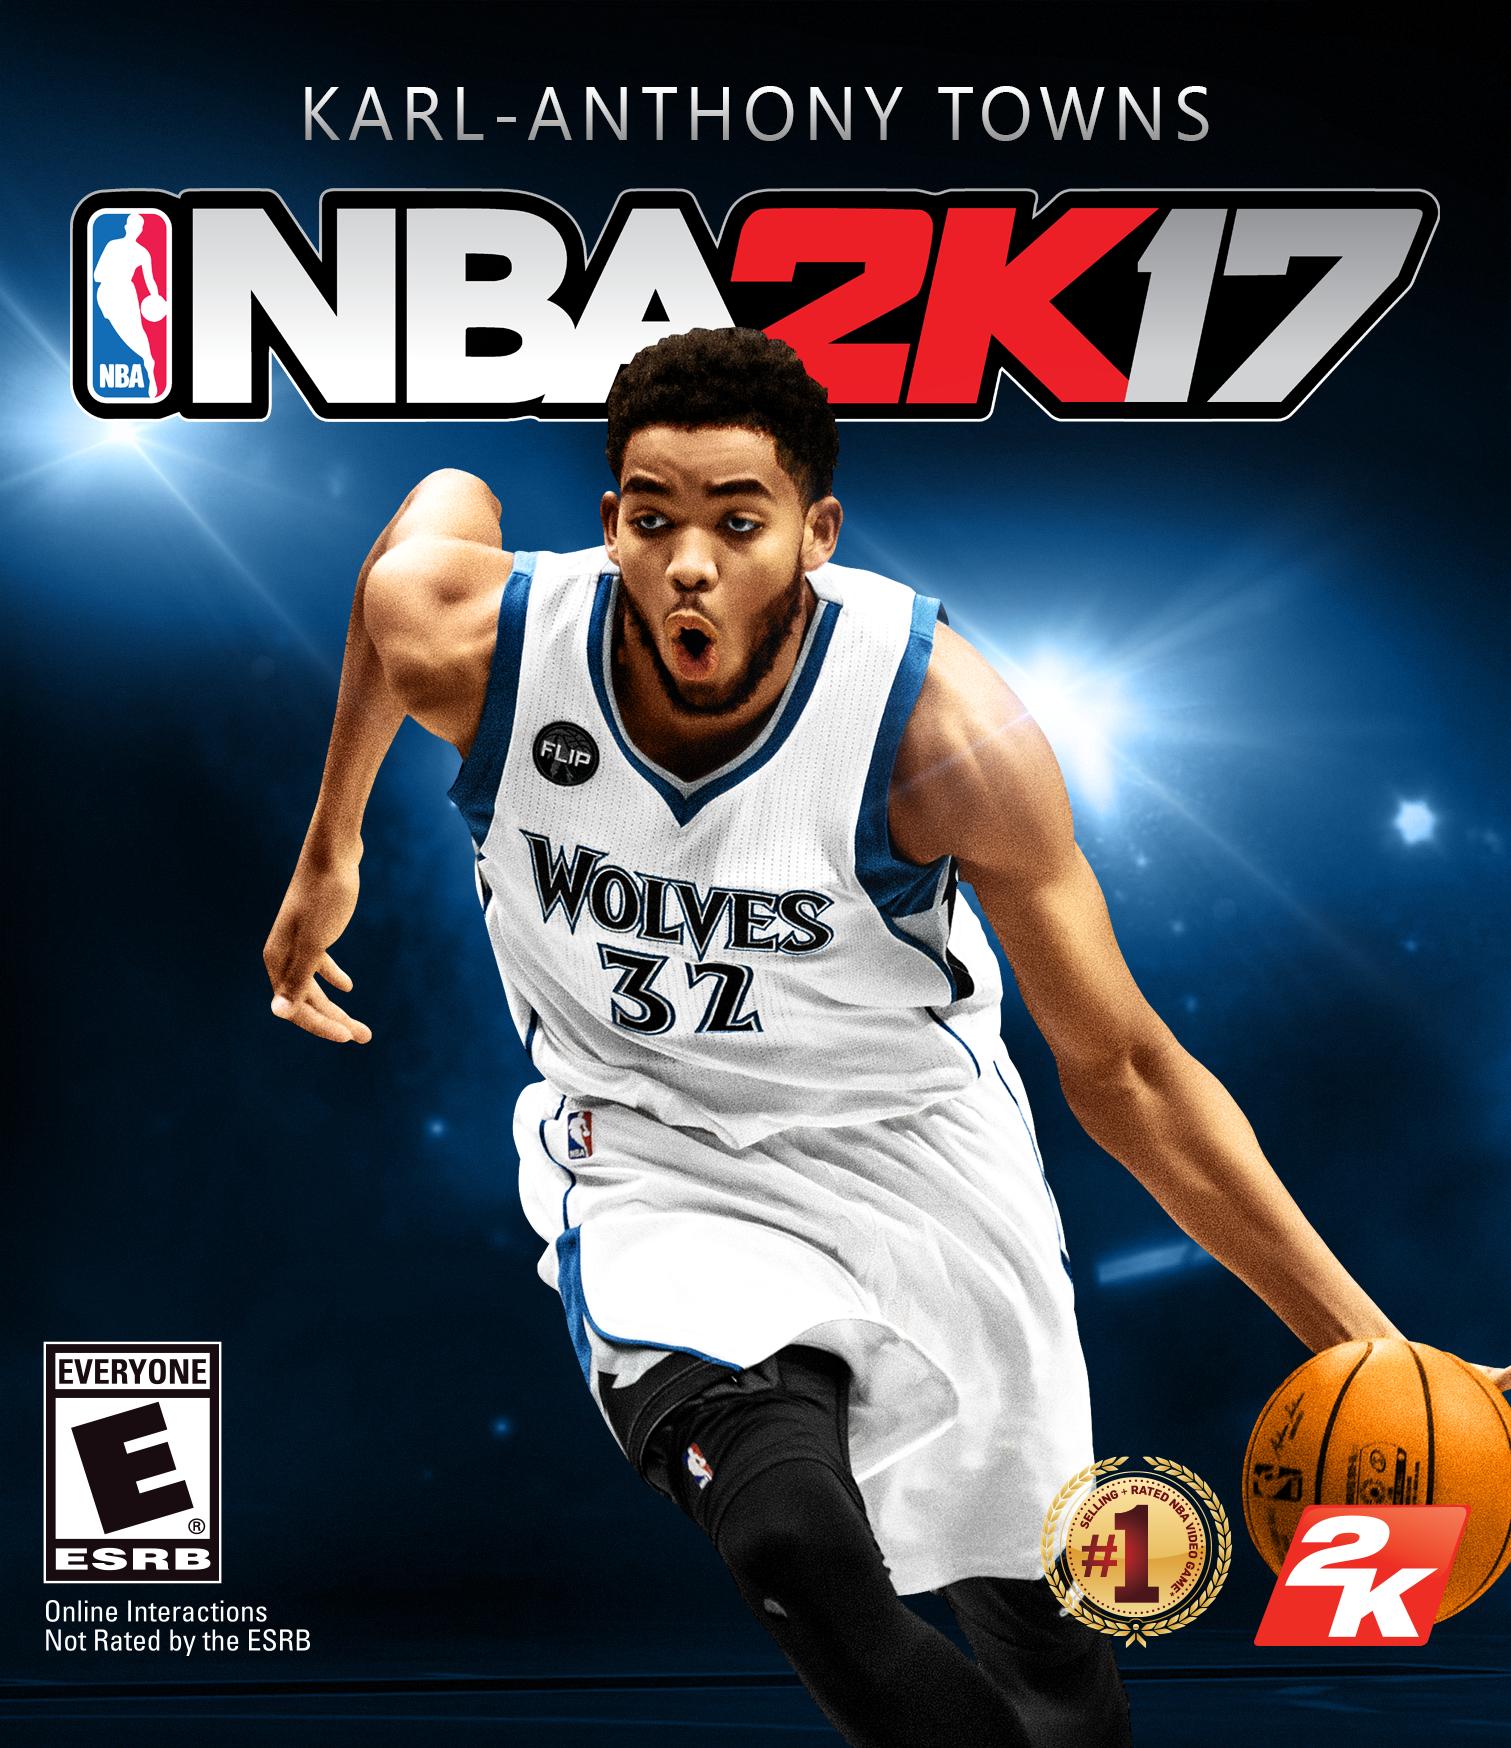 034bee51e57 NBA 2K17 Custom Covers - Page 5 - Operation Sports Forums